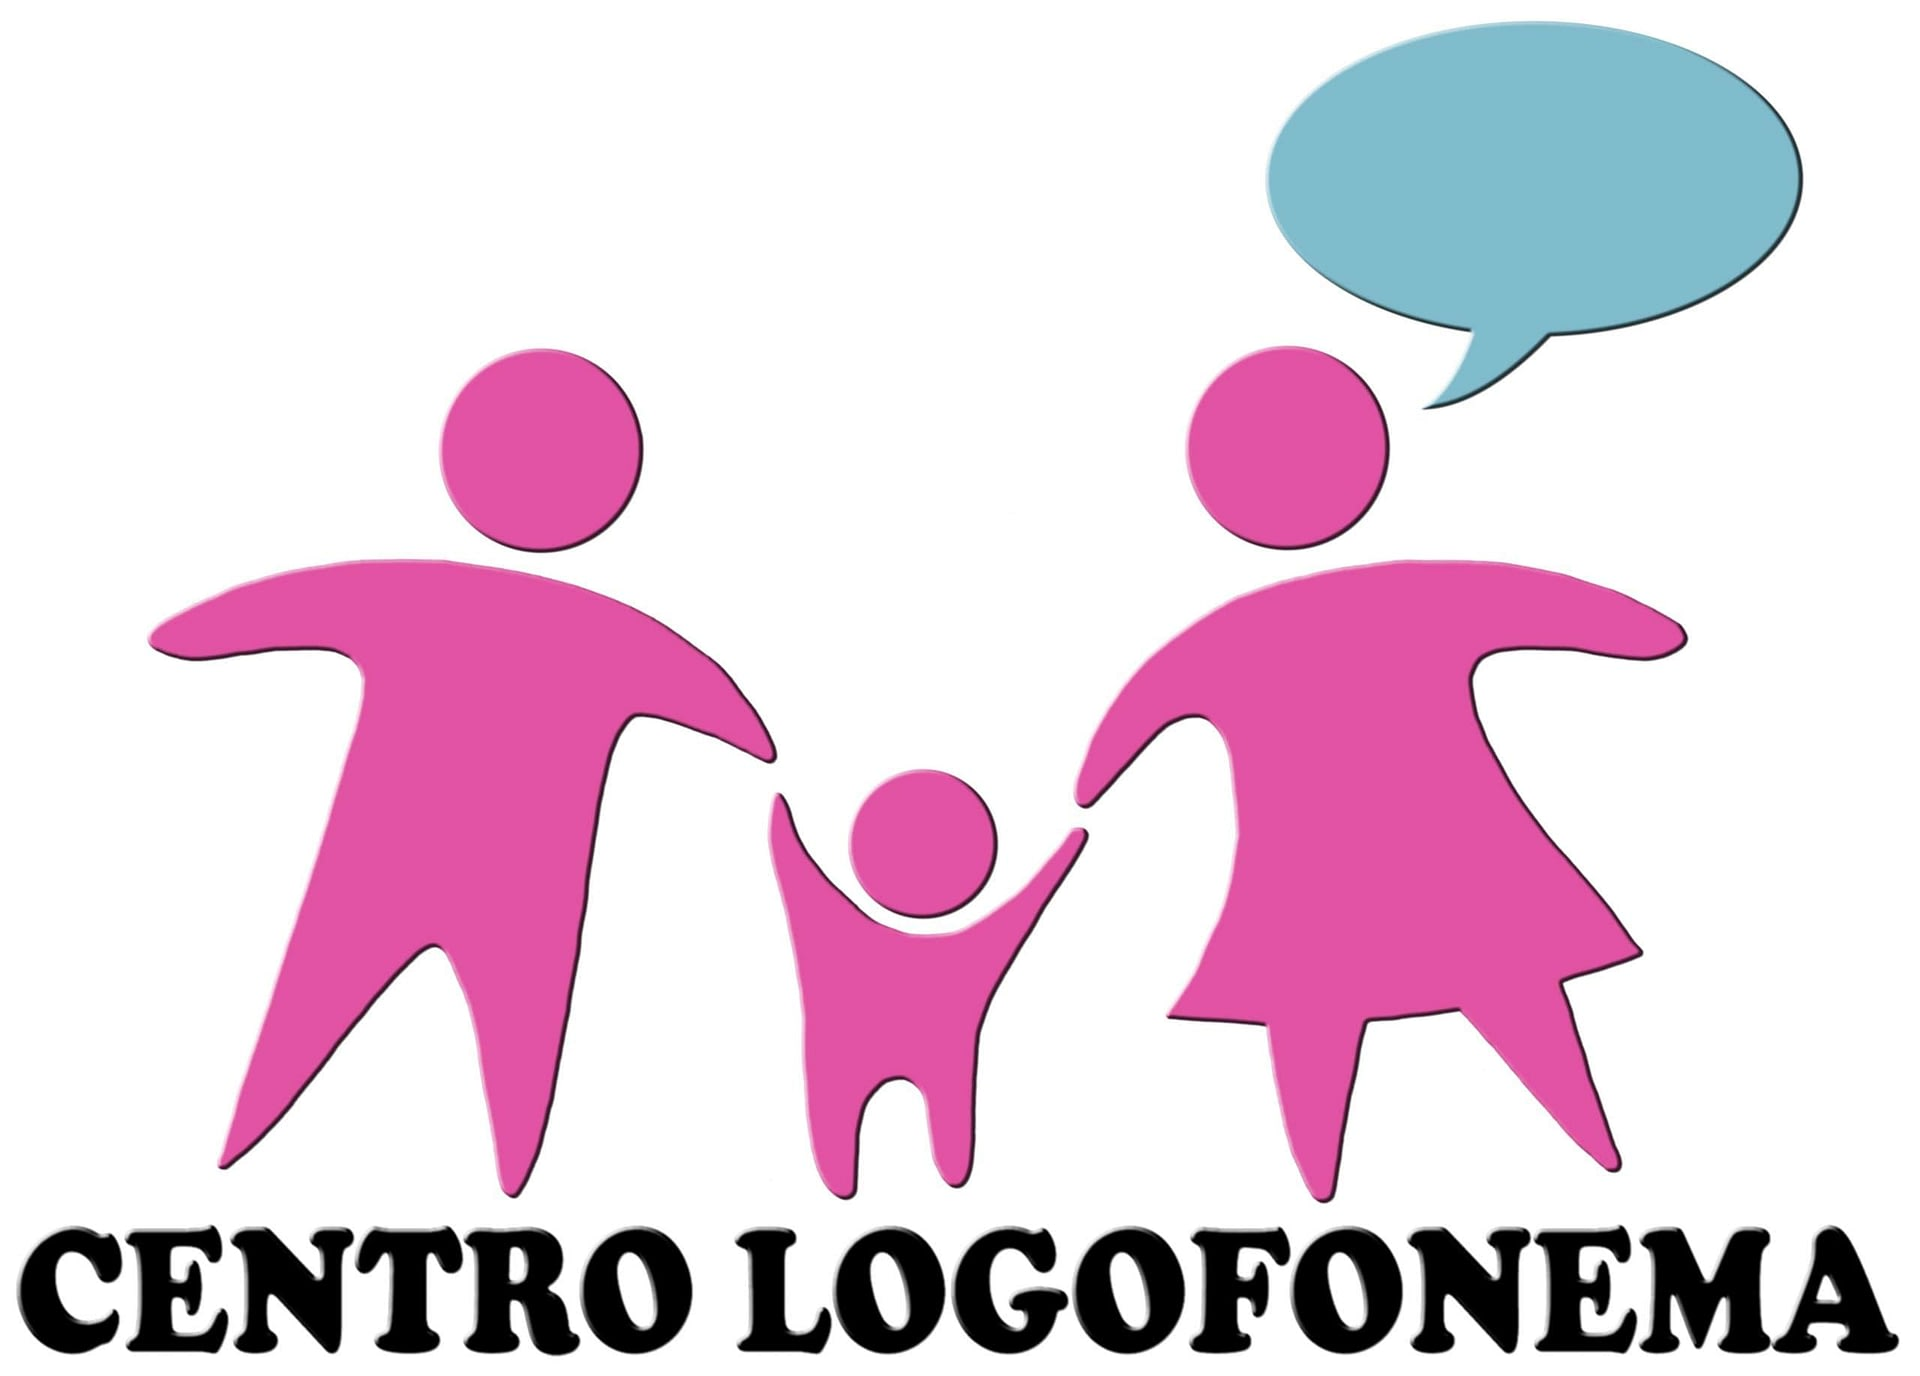 CENTRO LOGOFONEMA en Valdemoro - Madrid